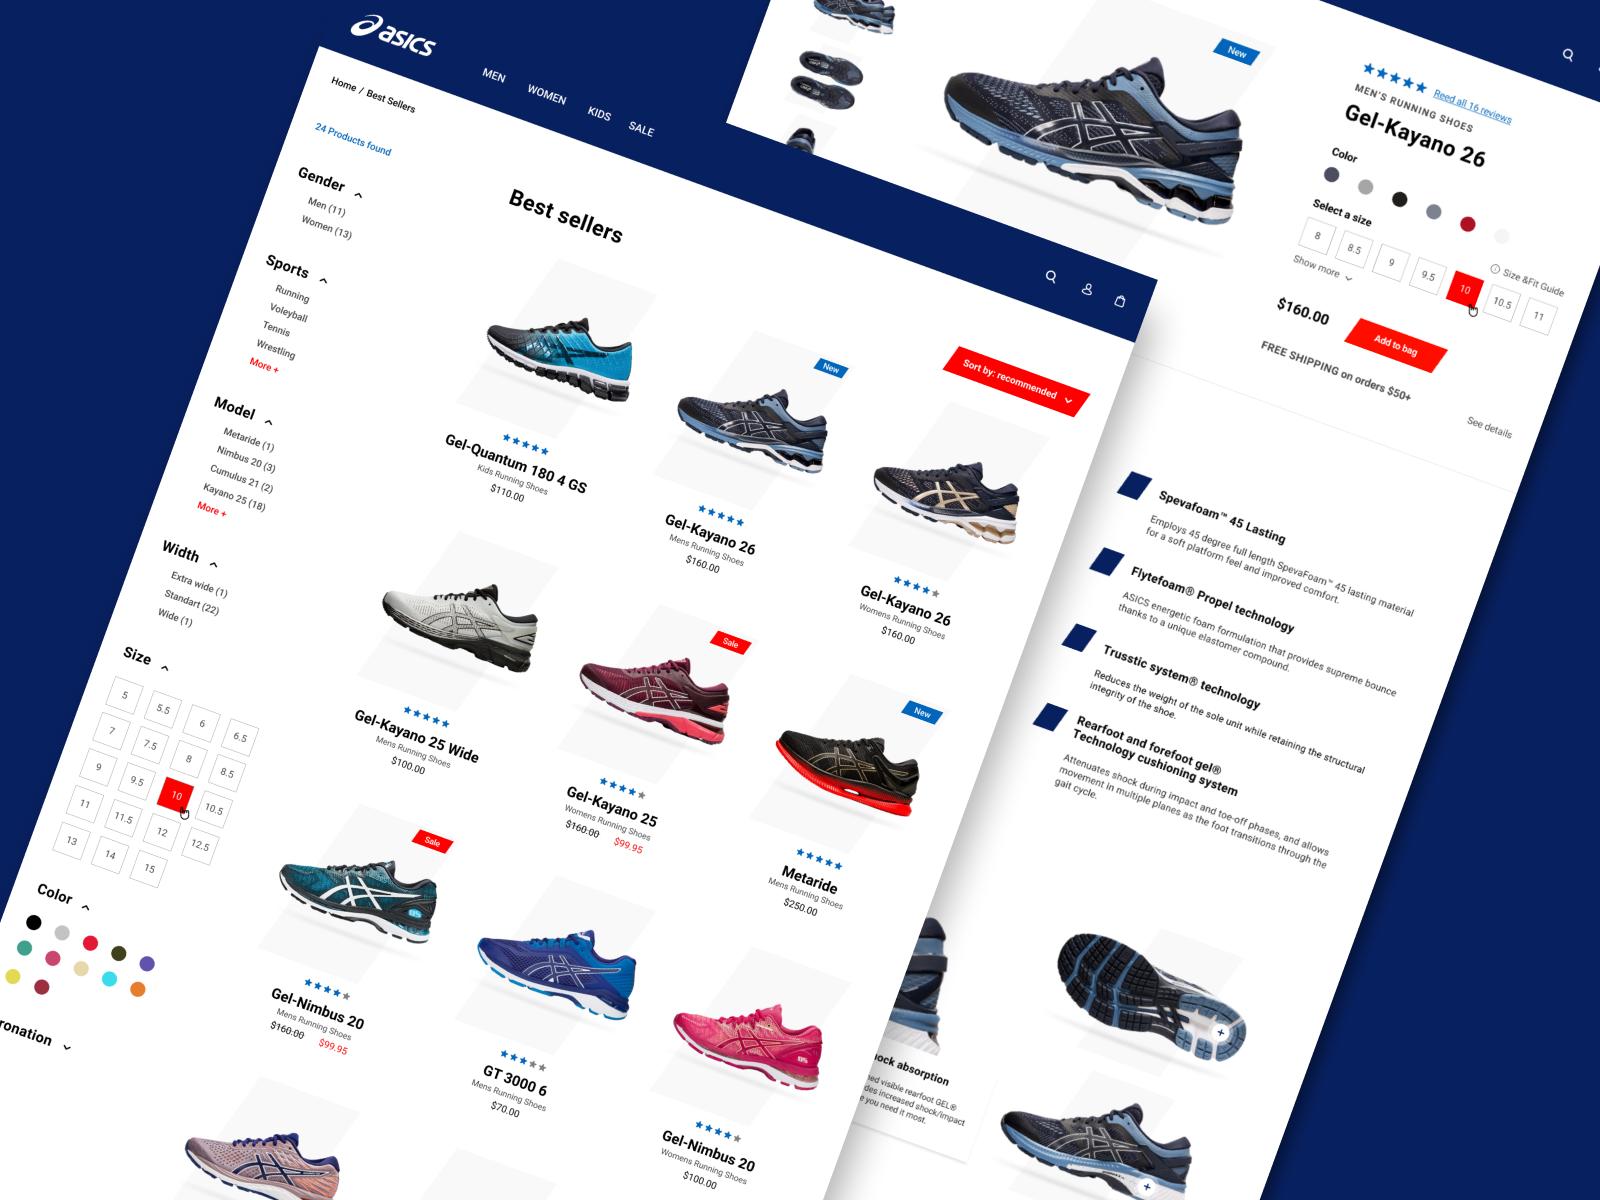 Фото Дизайн интернет-магазина кроссовок Asics. Страница каталога и страница товара.